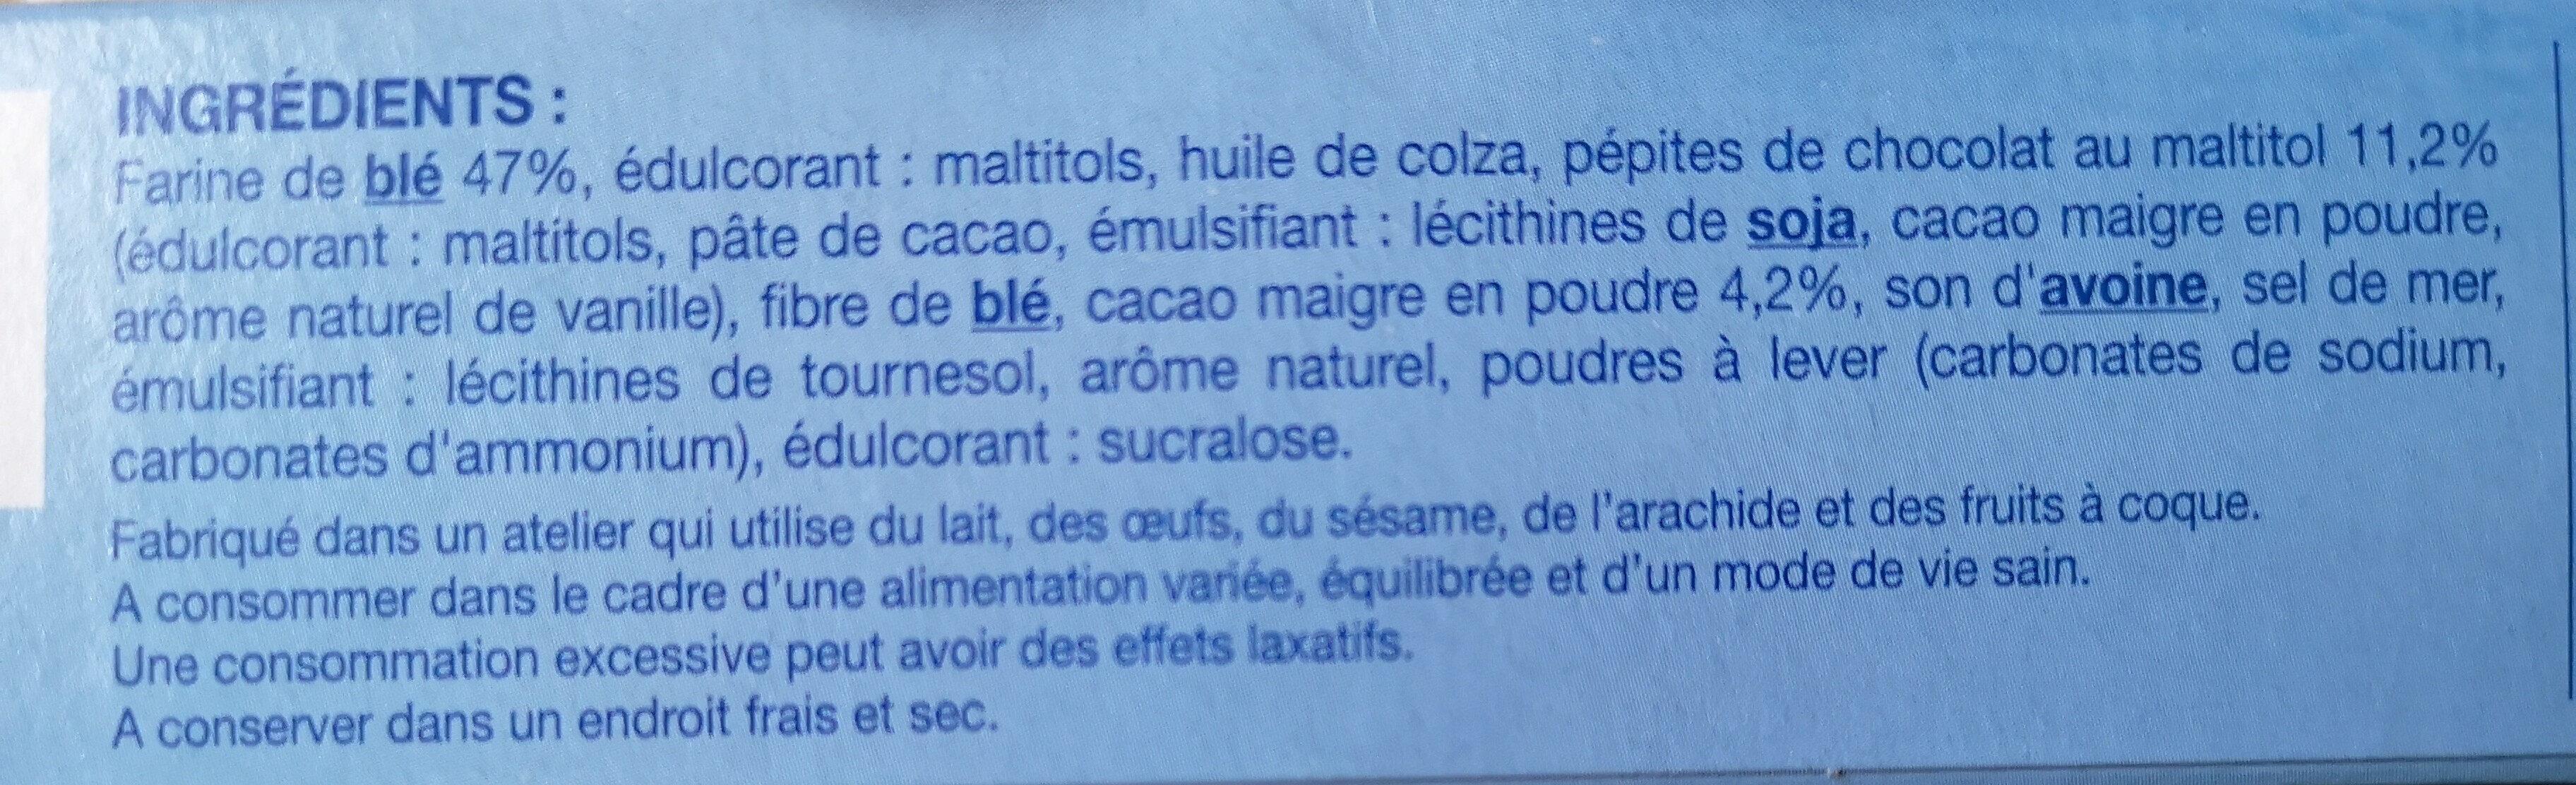 Cookie cacao pépites - Ingredientes - fr